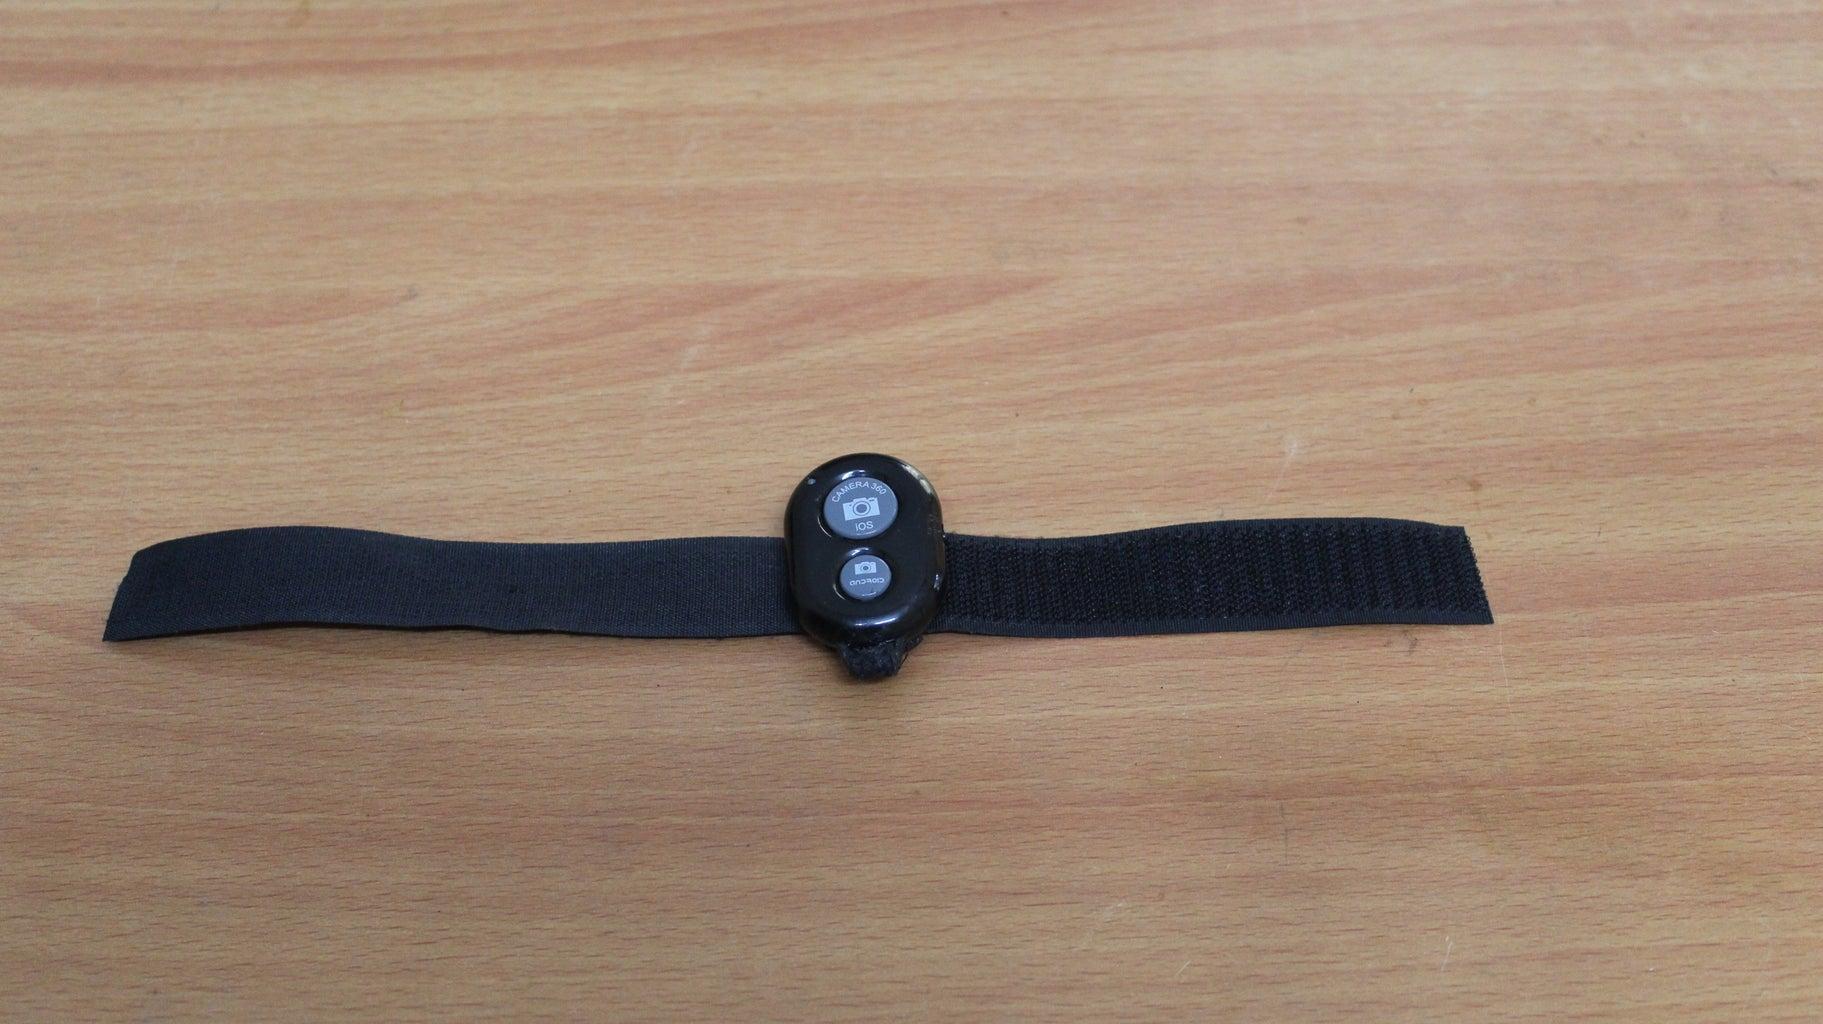 The Bluetooth Camera Shutter Wristband